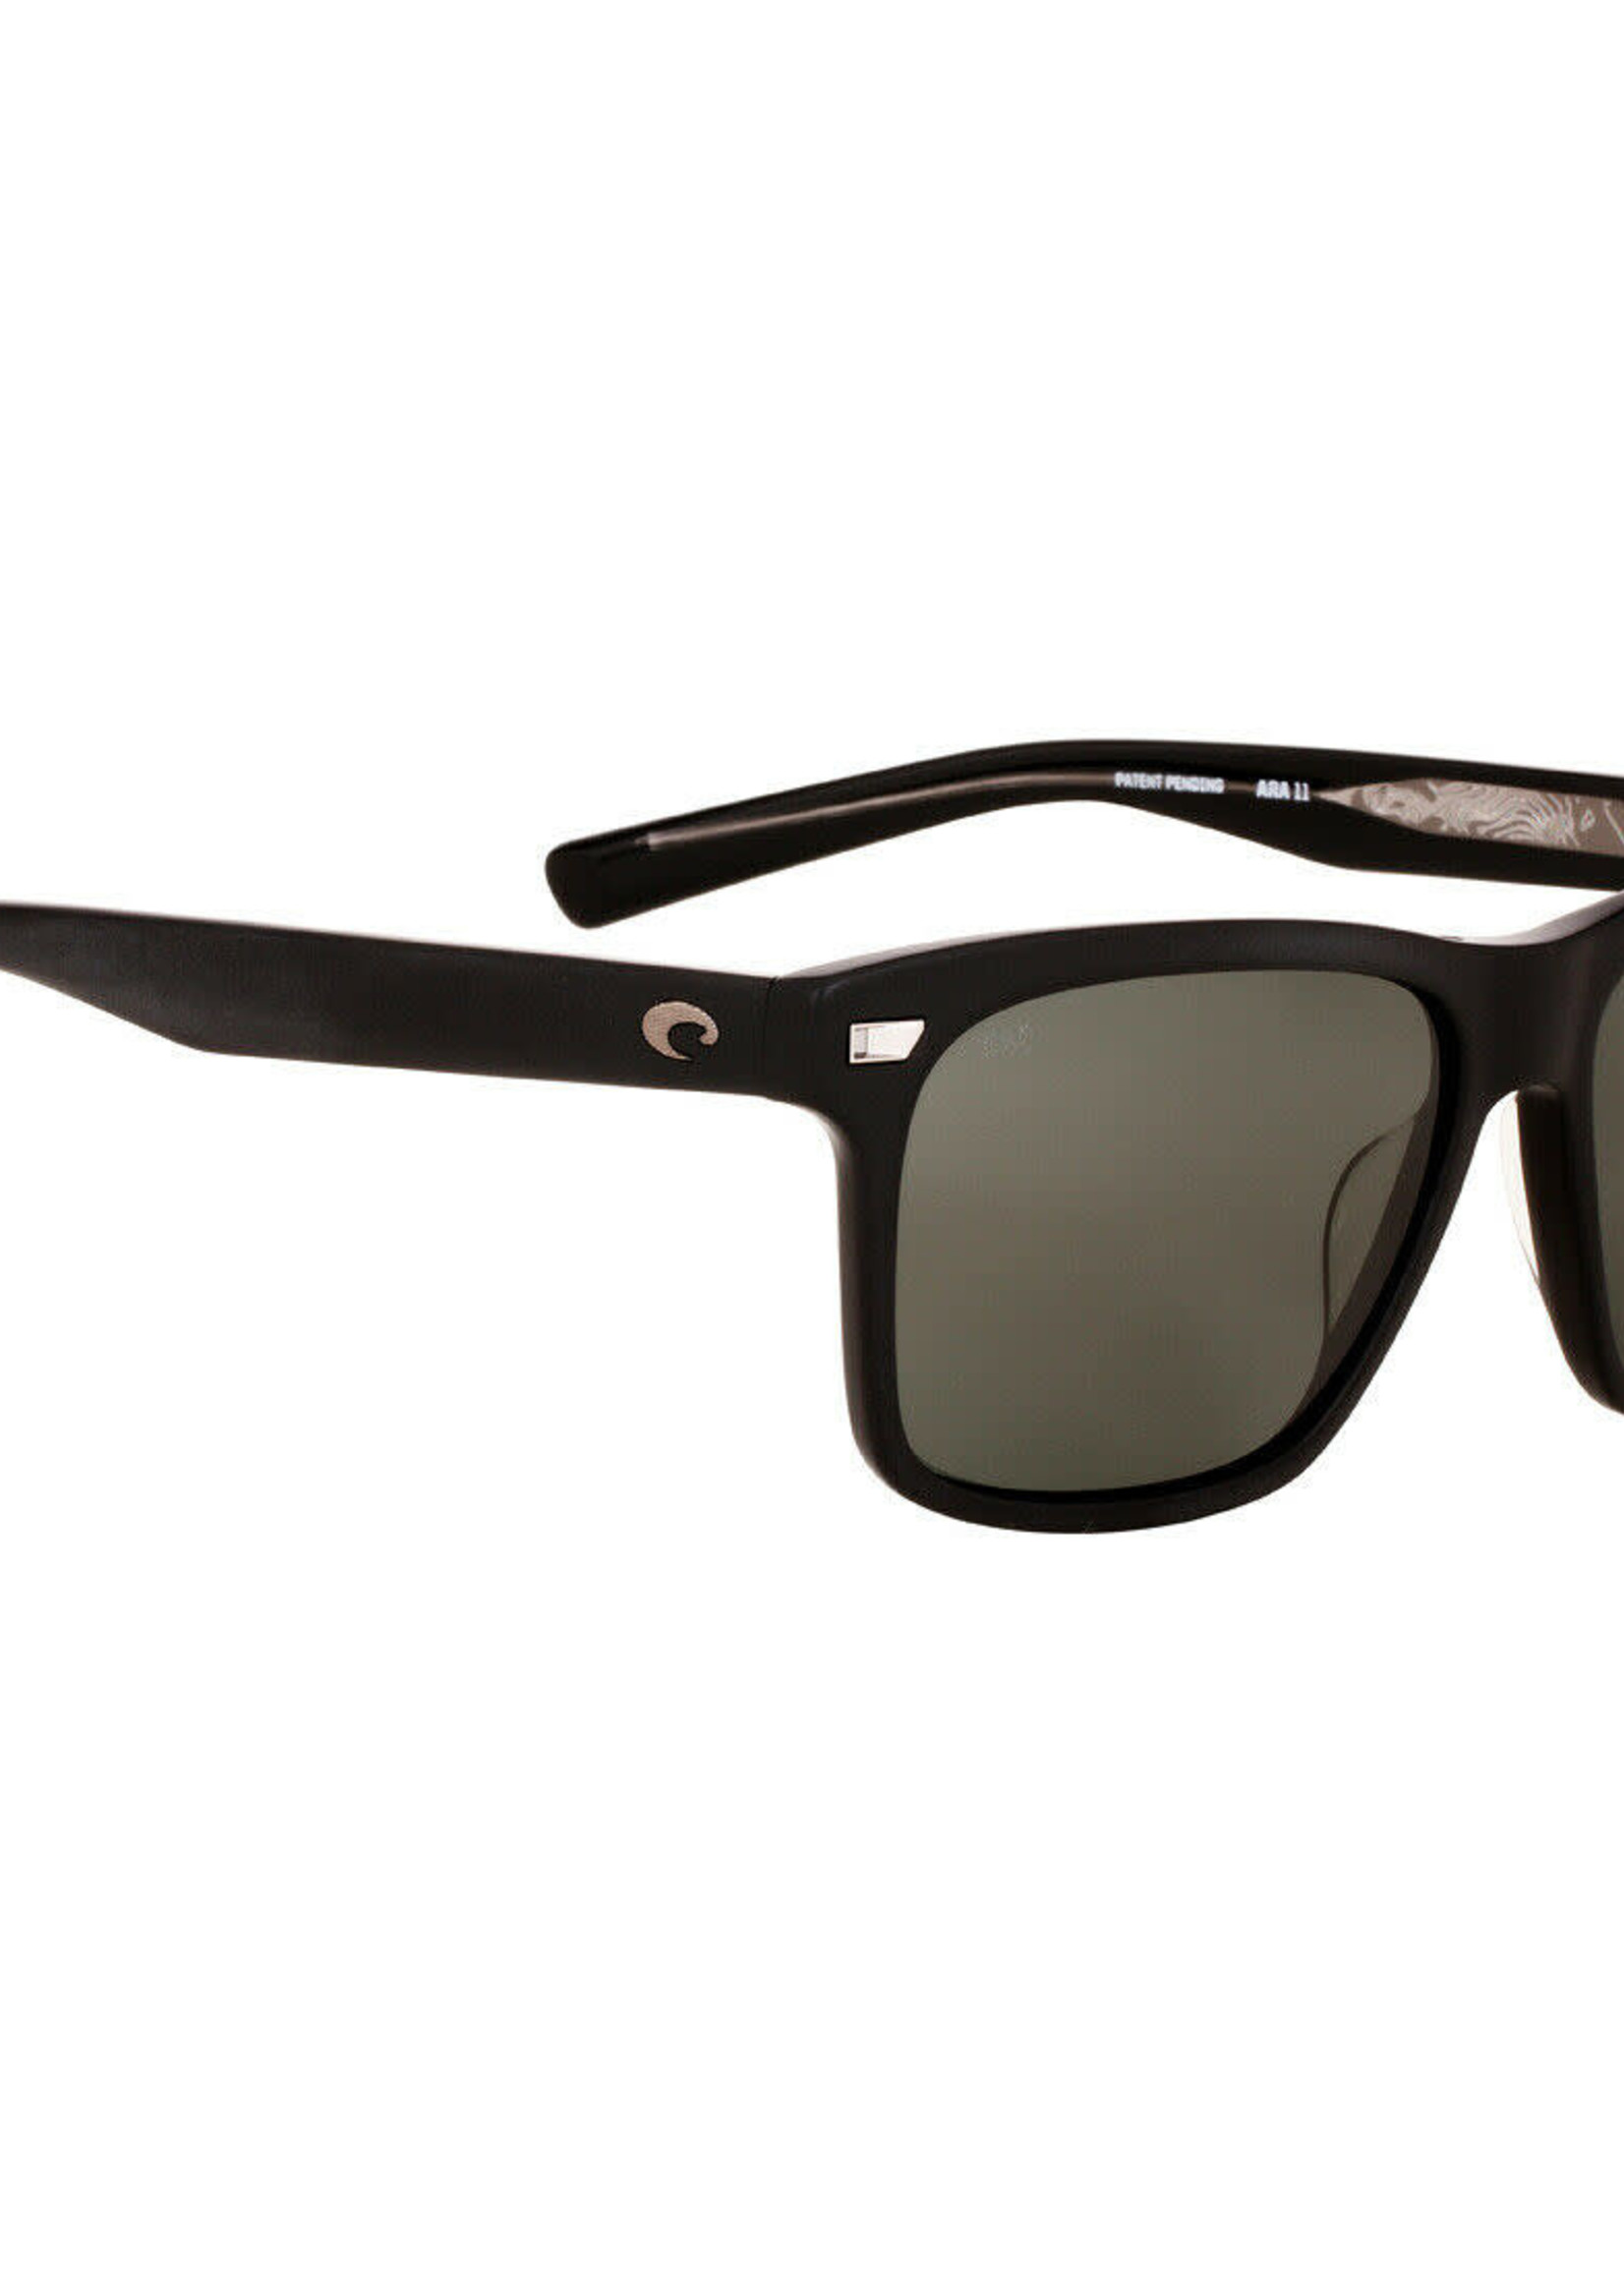 Costa del Mar Aransas Matte Black Grey Mirror 580G